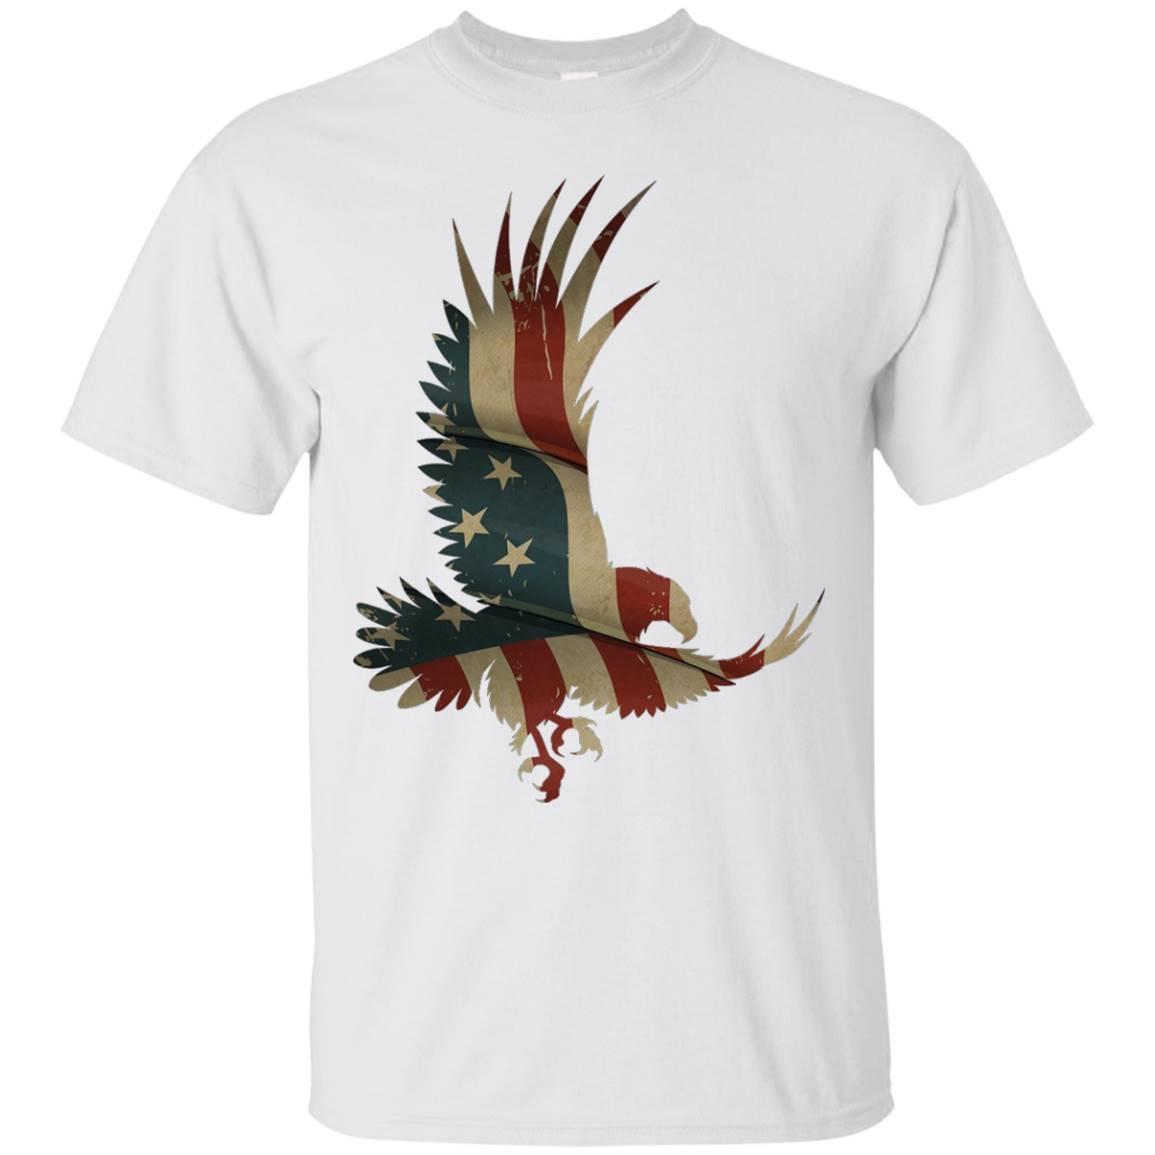 Eagle Flag T-shirt, Stars And Stripes USA American Flag Tee